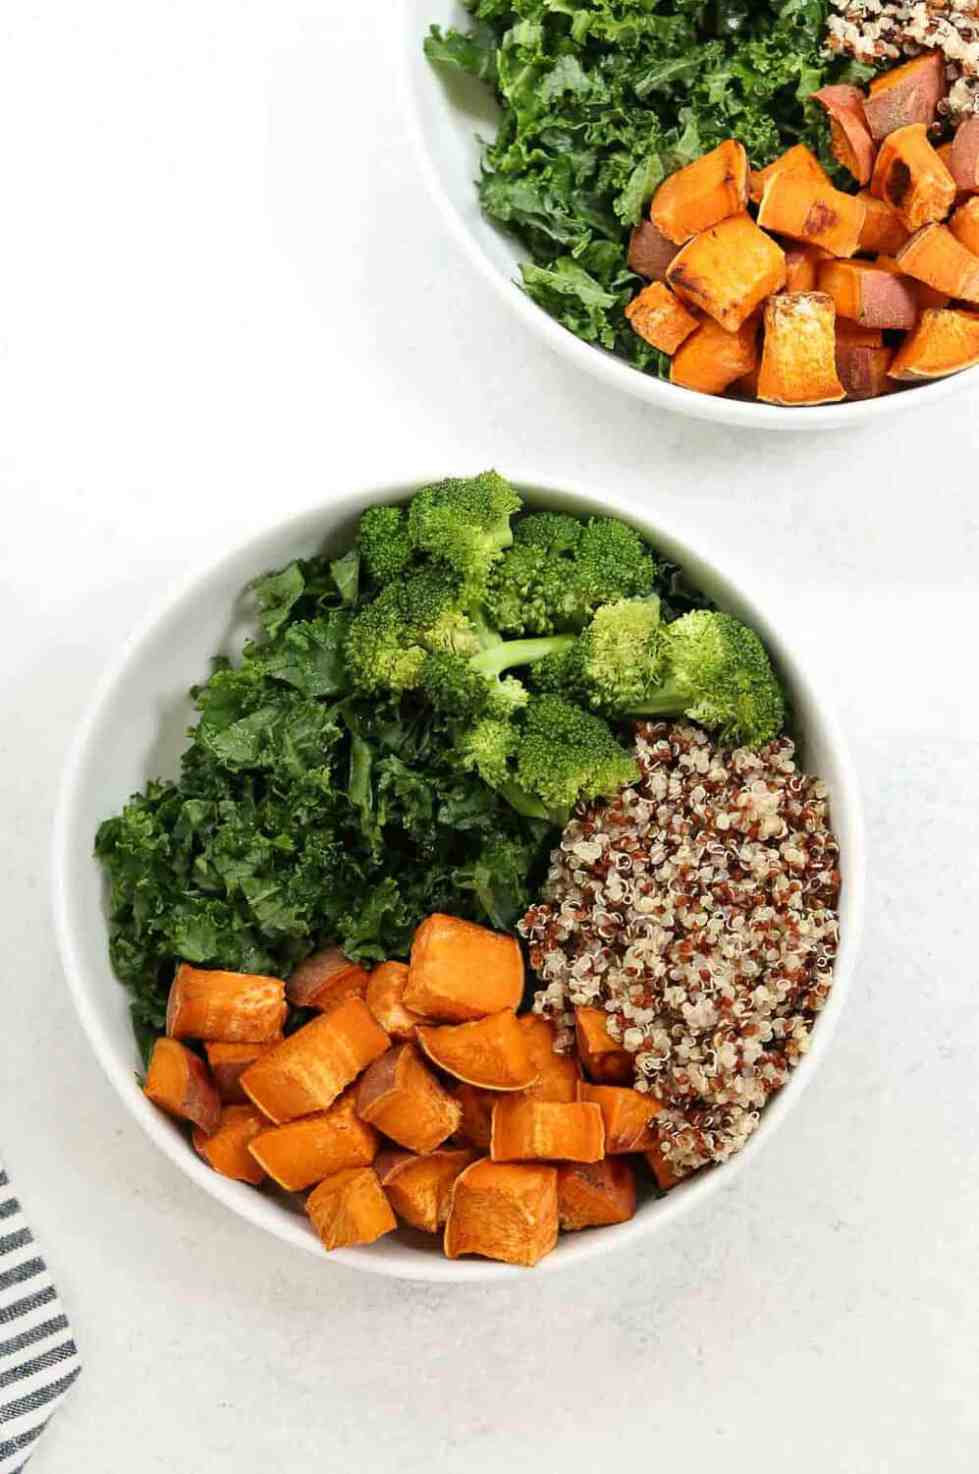 kale, sweet potato, broccoli and quinoa in two white bowls.